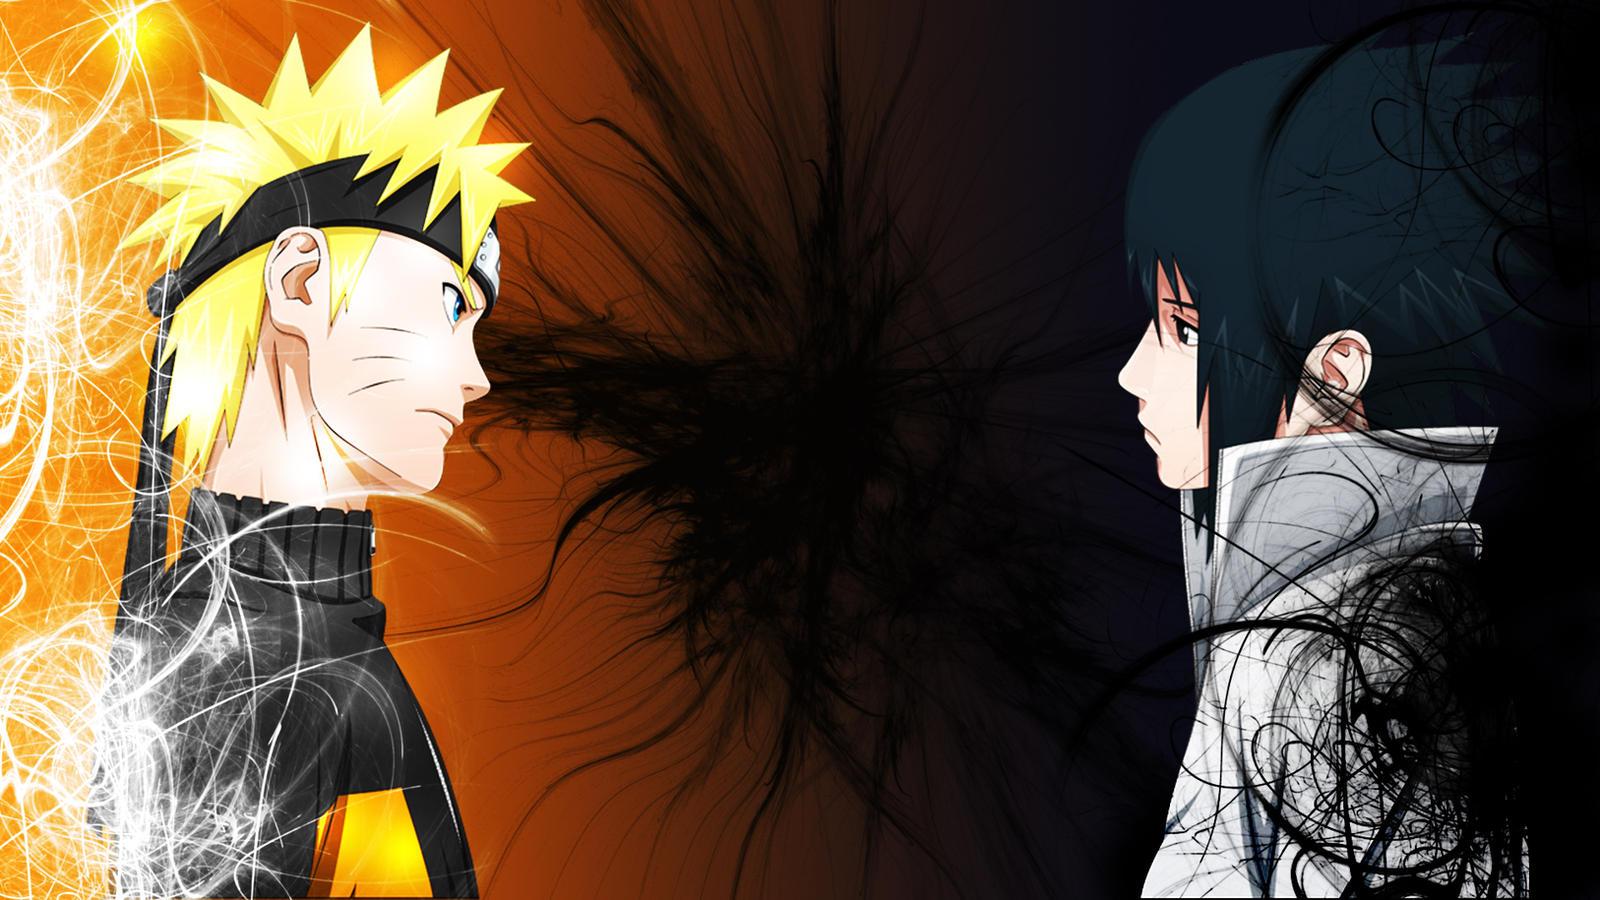 Naruto X Sasuke Full Hd Wallpaper By Oxelon On Deviantart